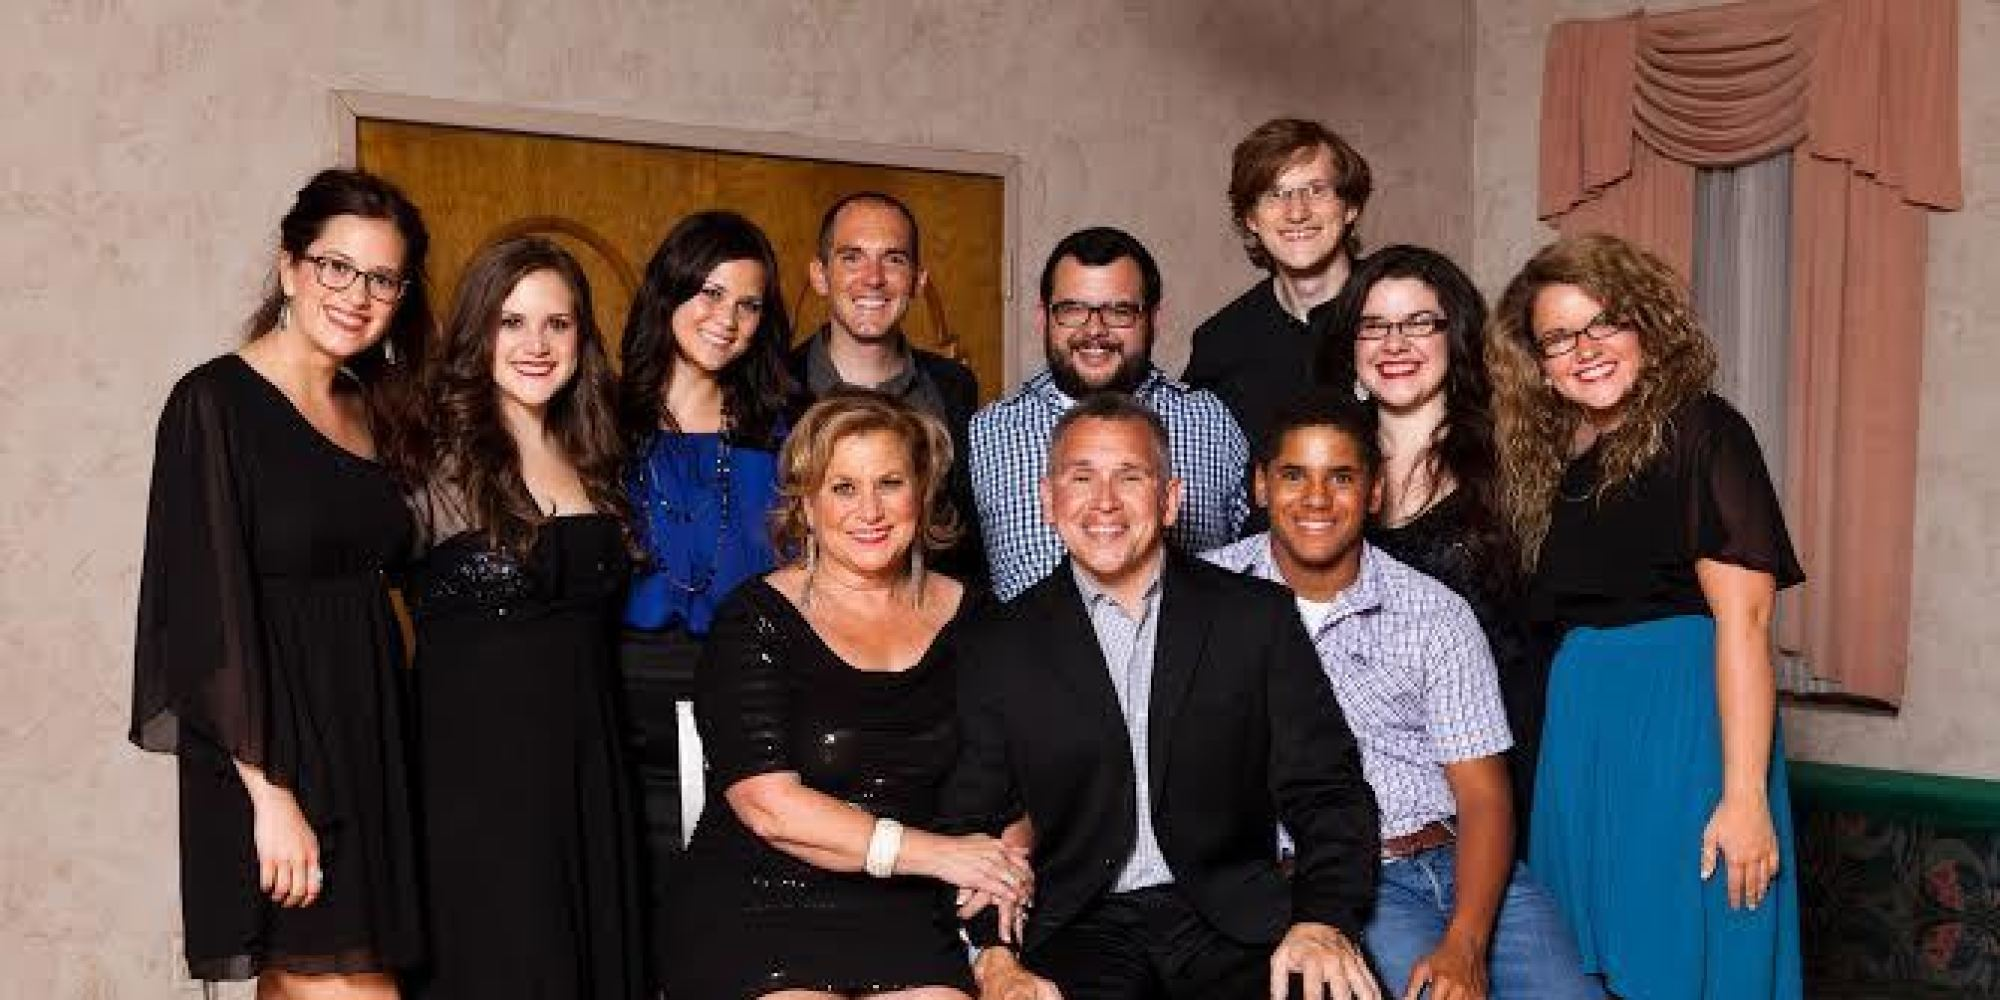 Sandi pattys first husband - Christian Music Star Sandi Patty Shares Her Best Advice On Blending A Family Huffpost